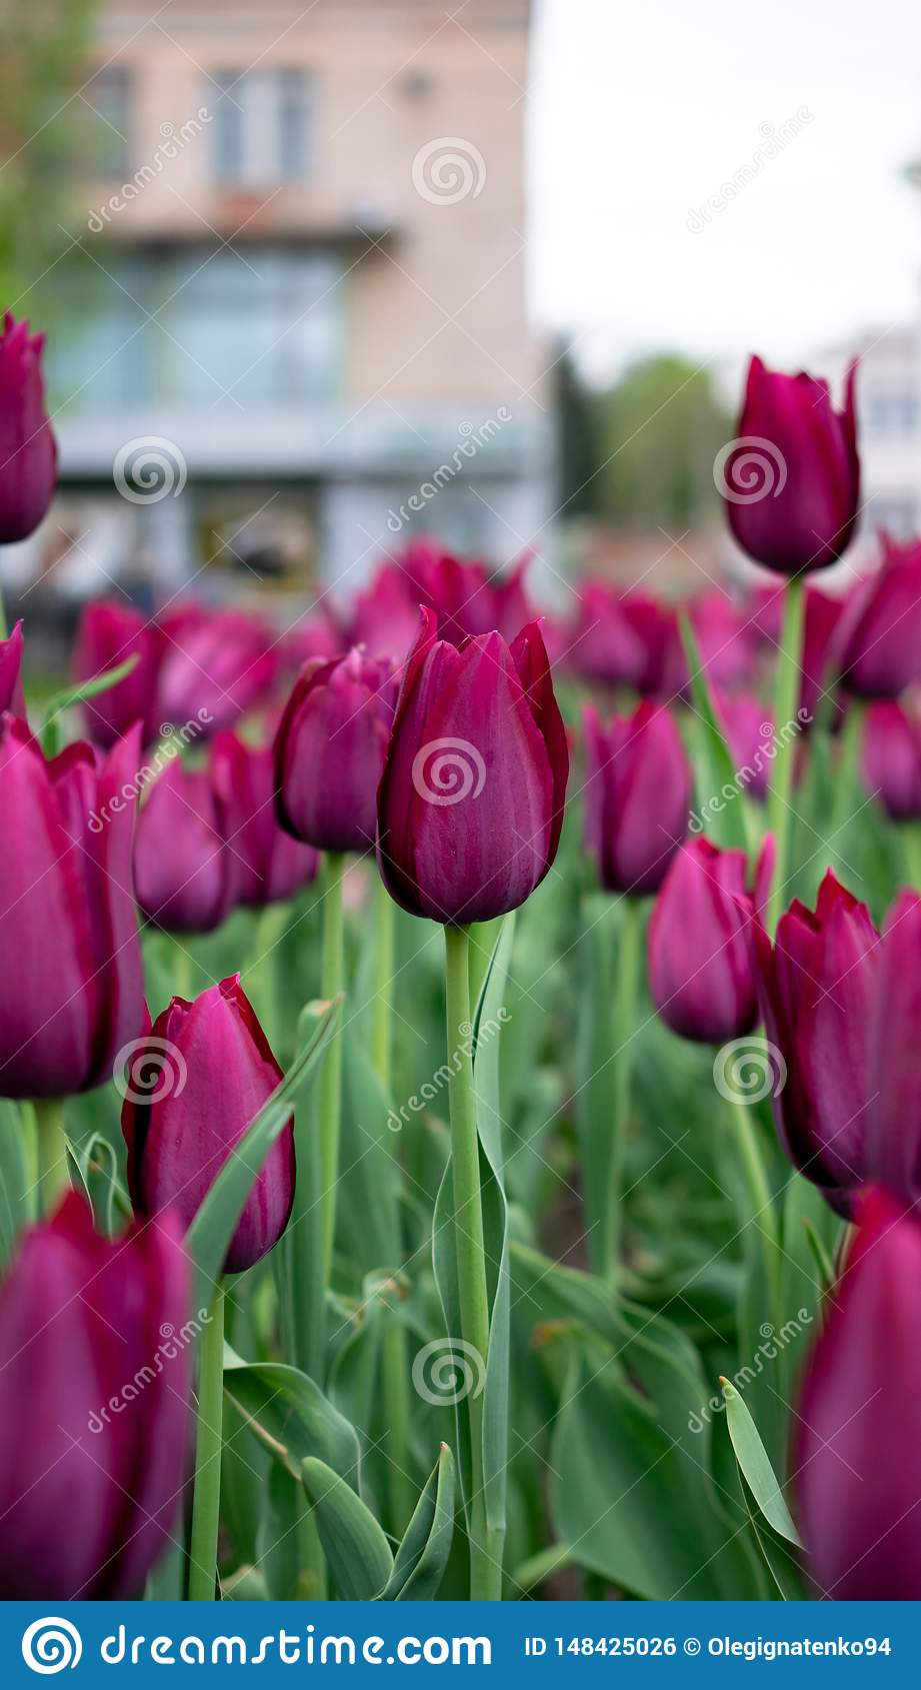 Dark pink tulips in the city park.